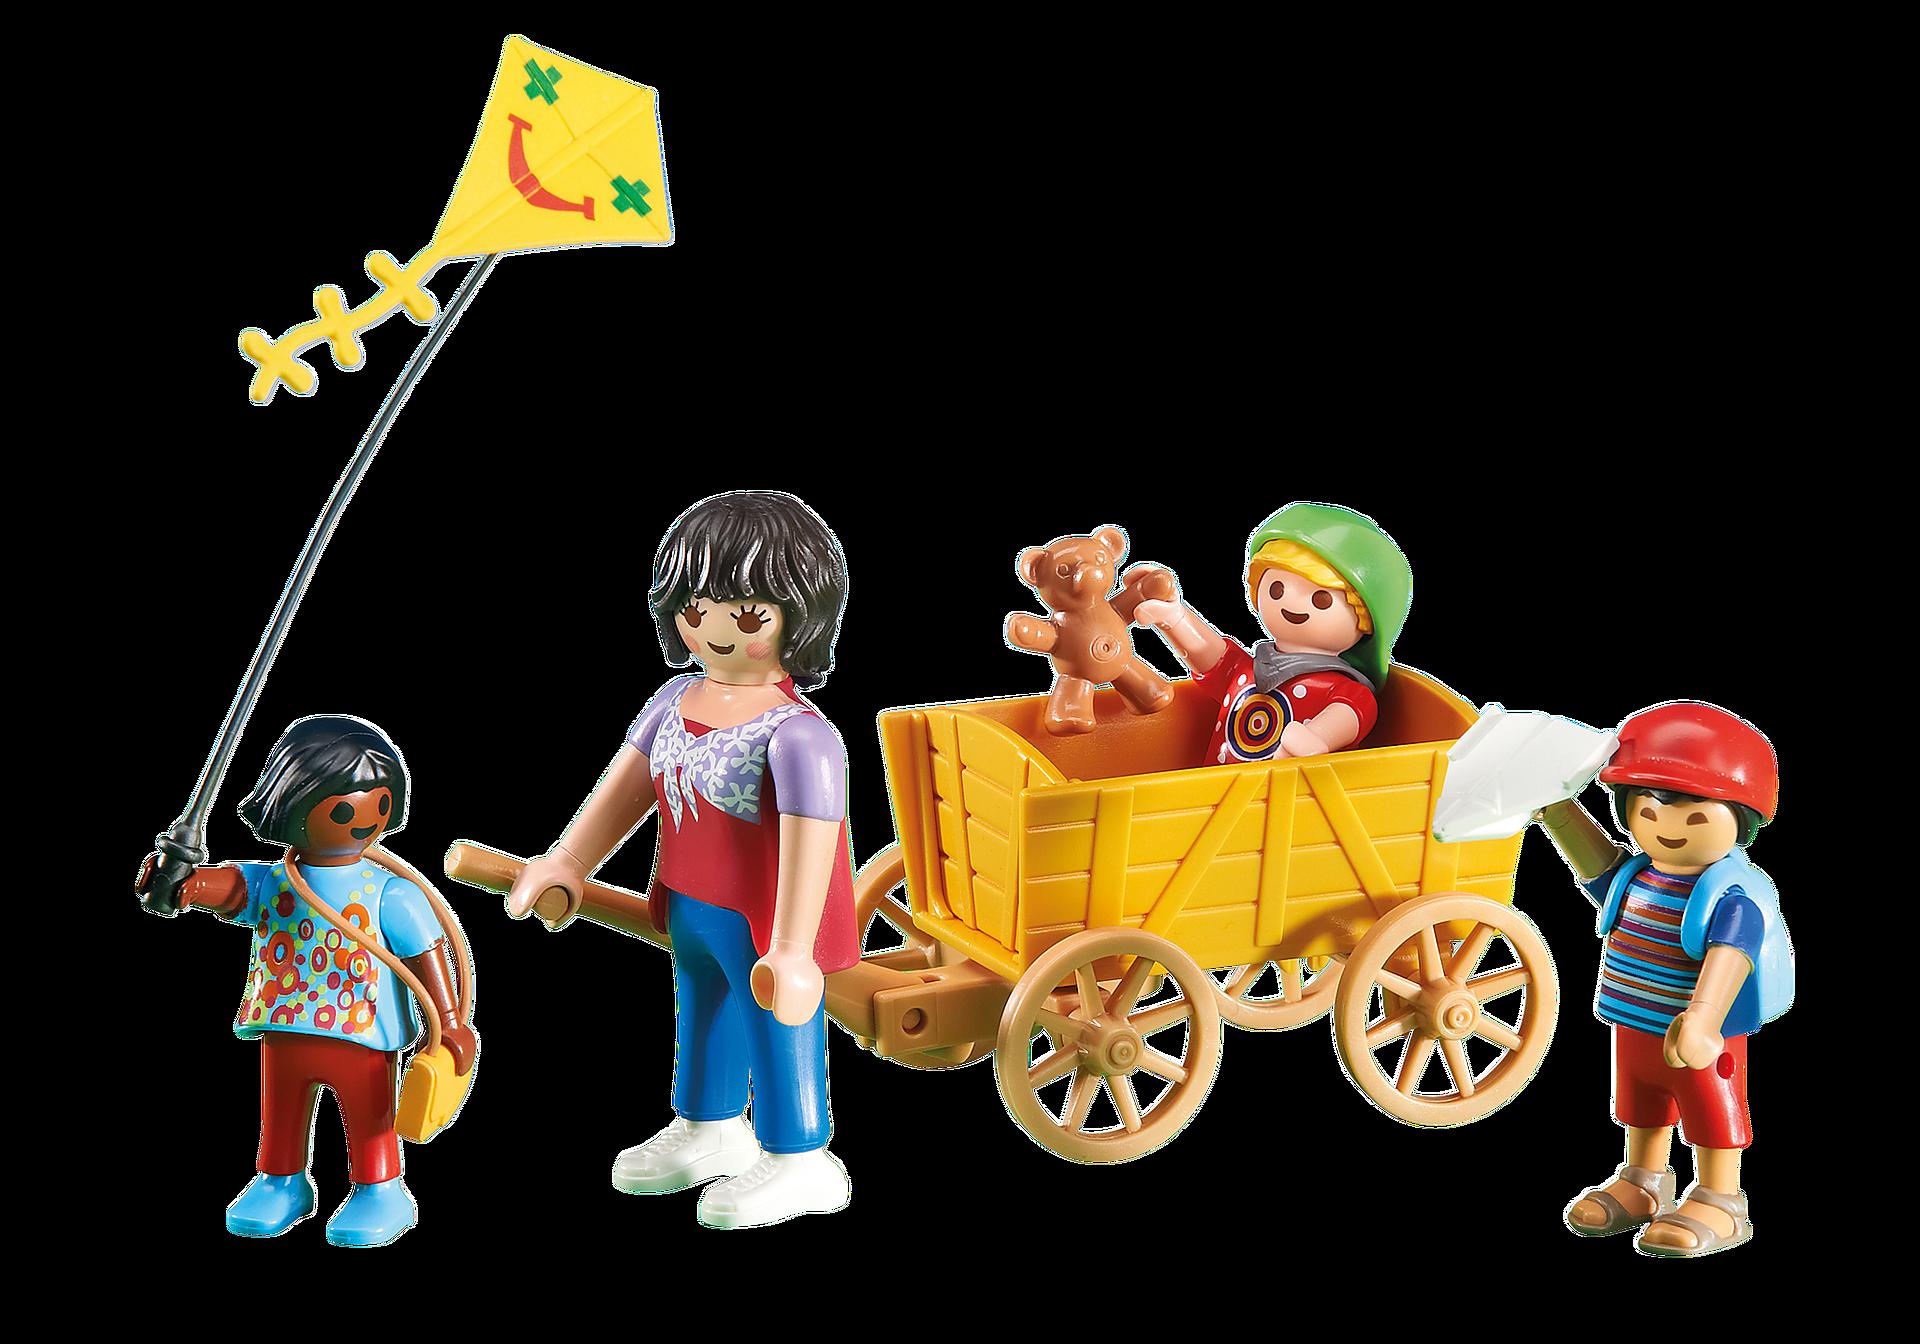 http://media.playmobil.com/i/playmobil/6439_product_detail/Δασκάλα με παιδάκια και καροτσάκι